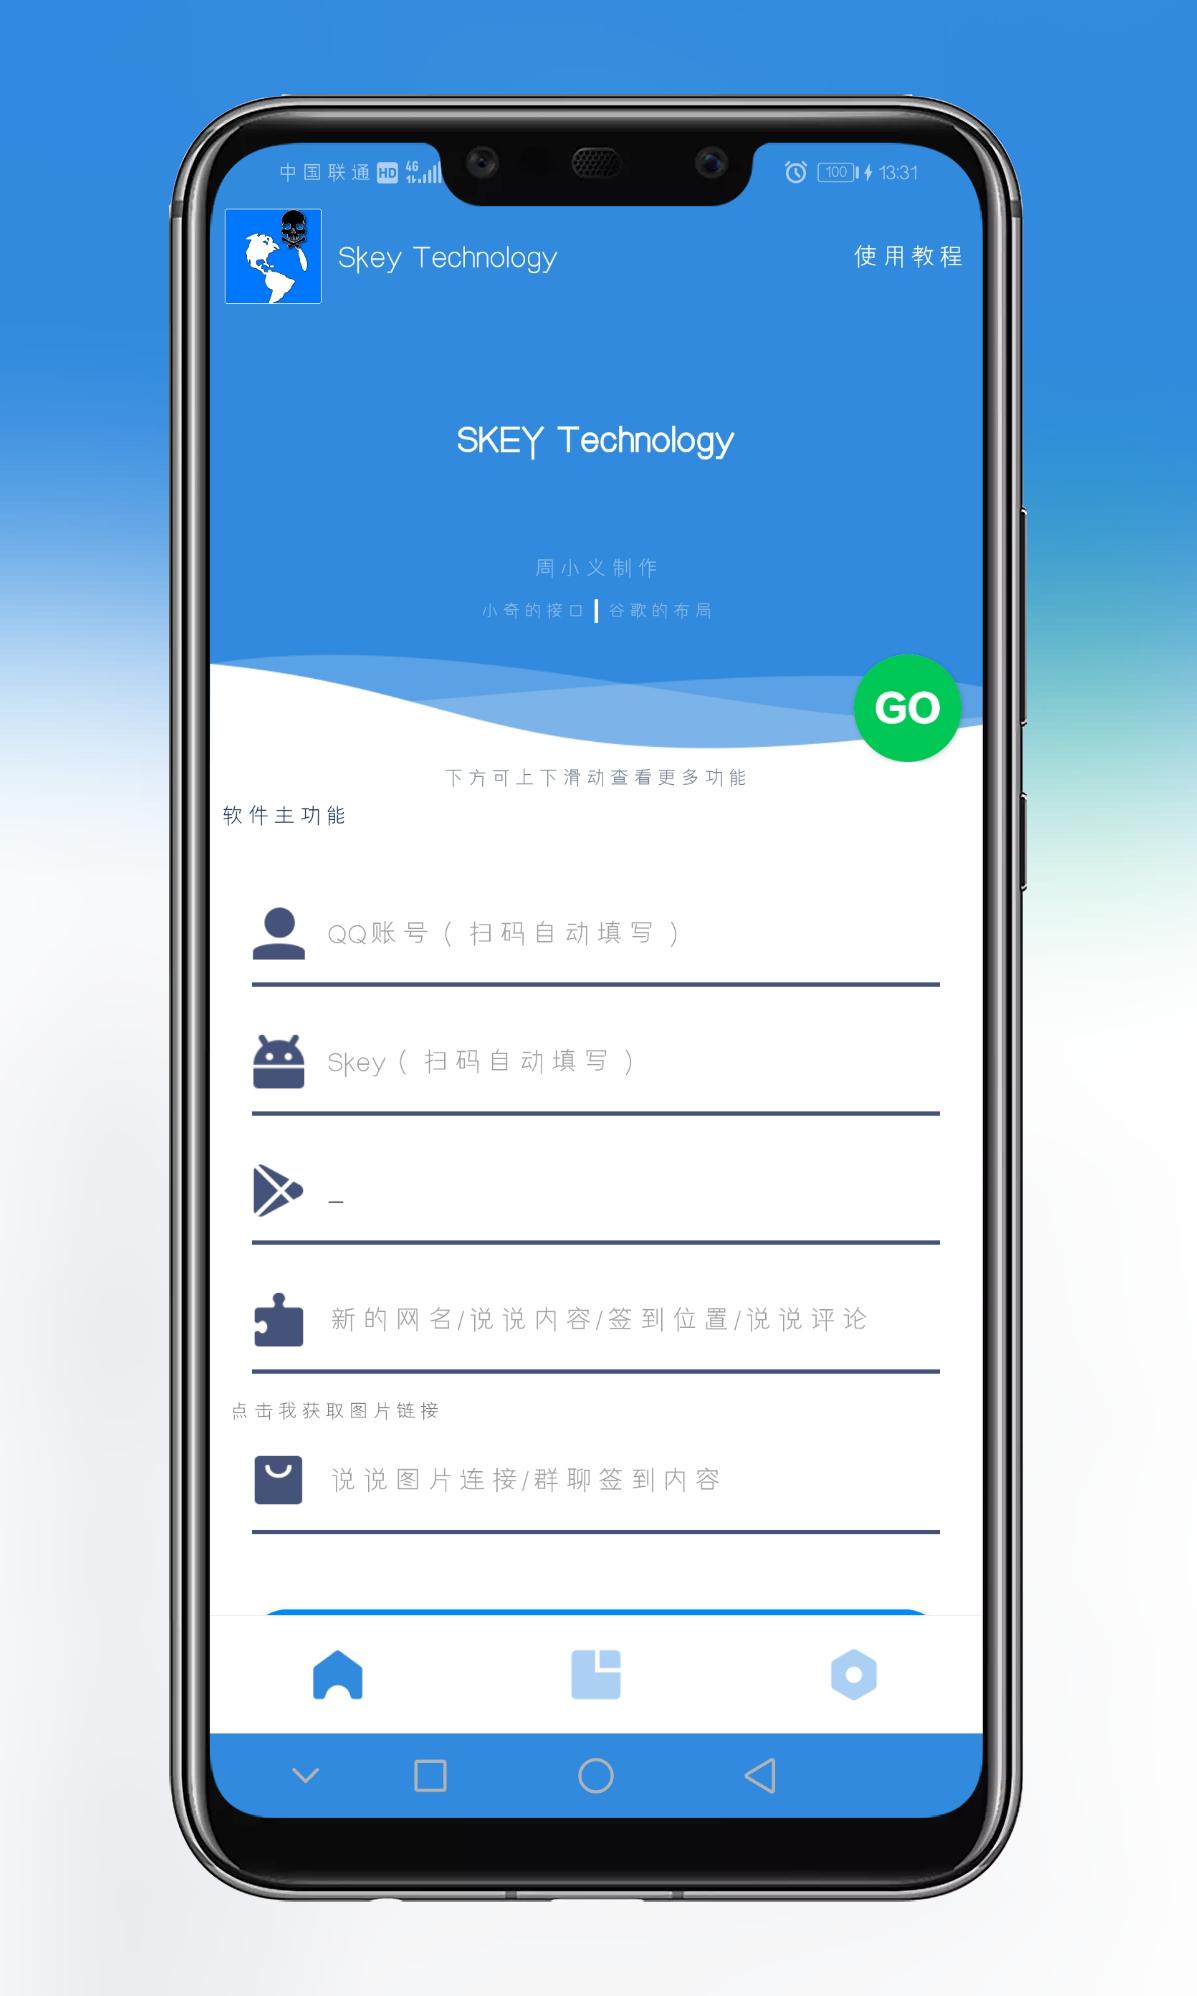 【原创】QQ黑科技skey technology!v1.9